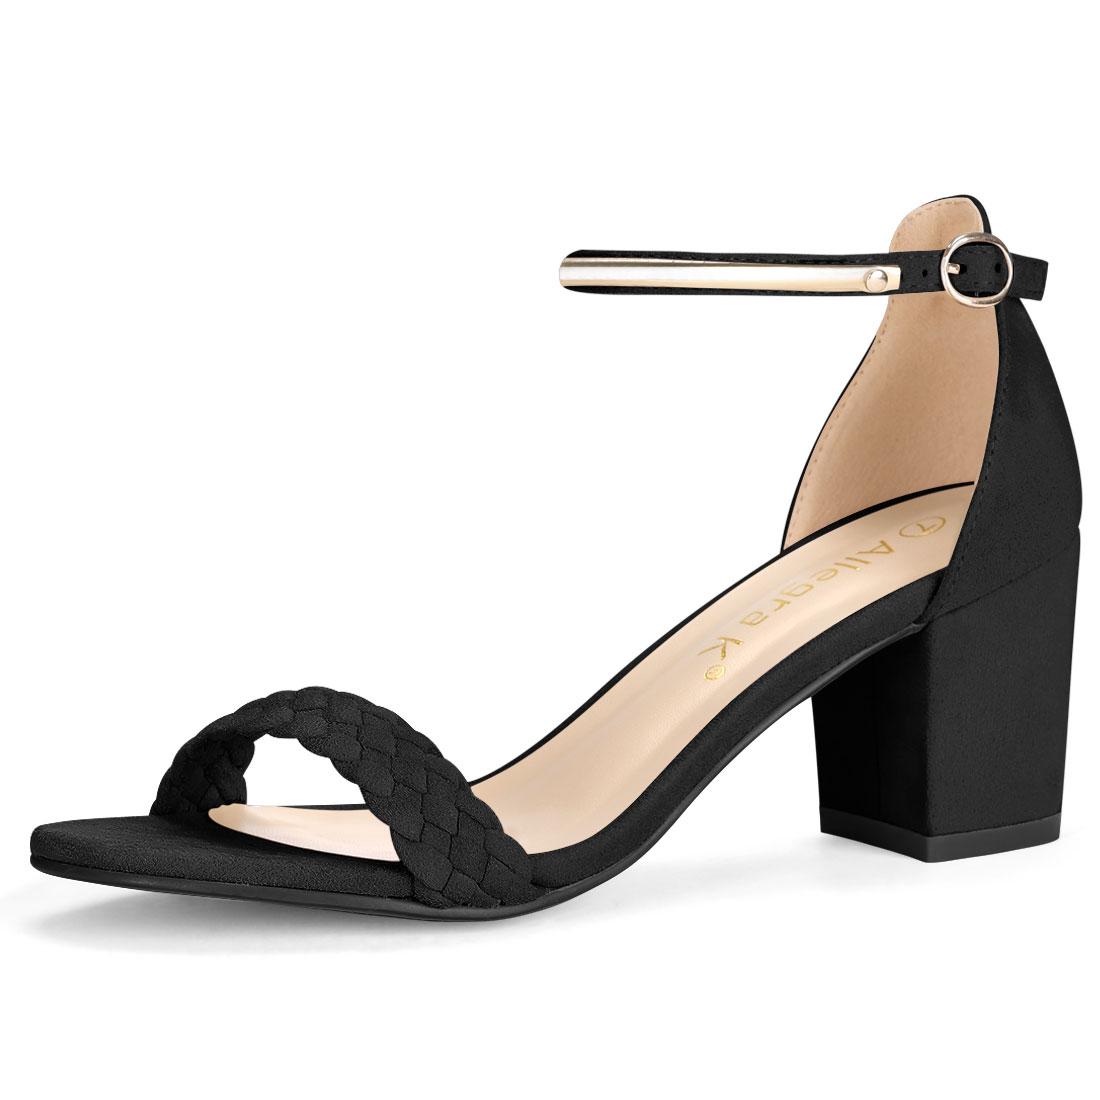 Women Open Toe Mid Heel Braided Ankle Strap Sandals Black US 8